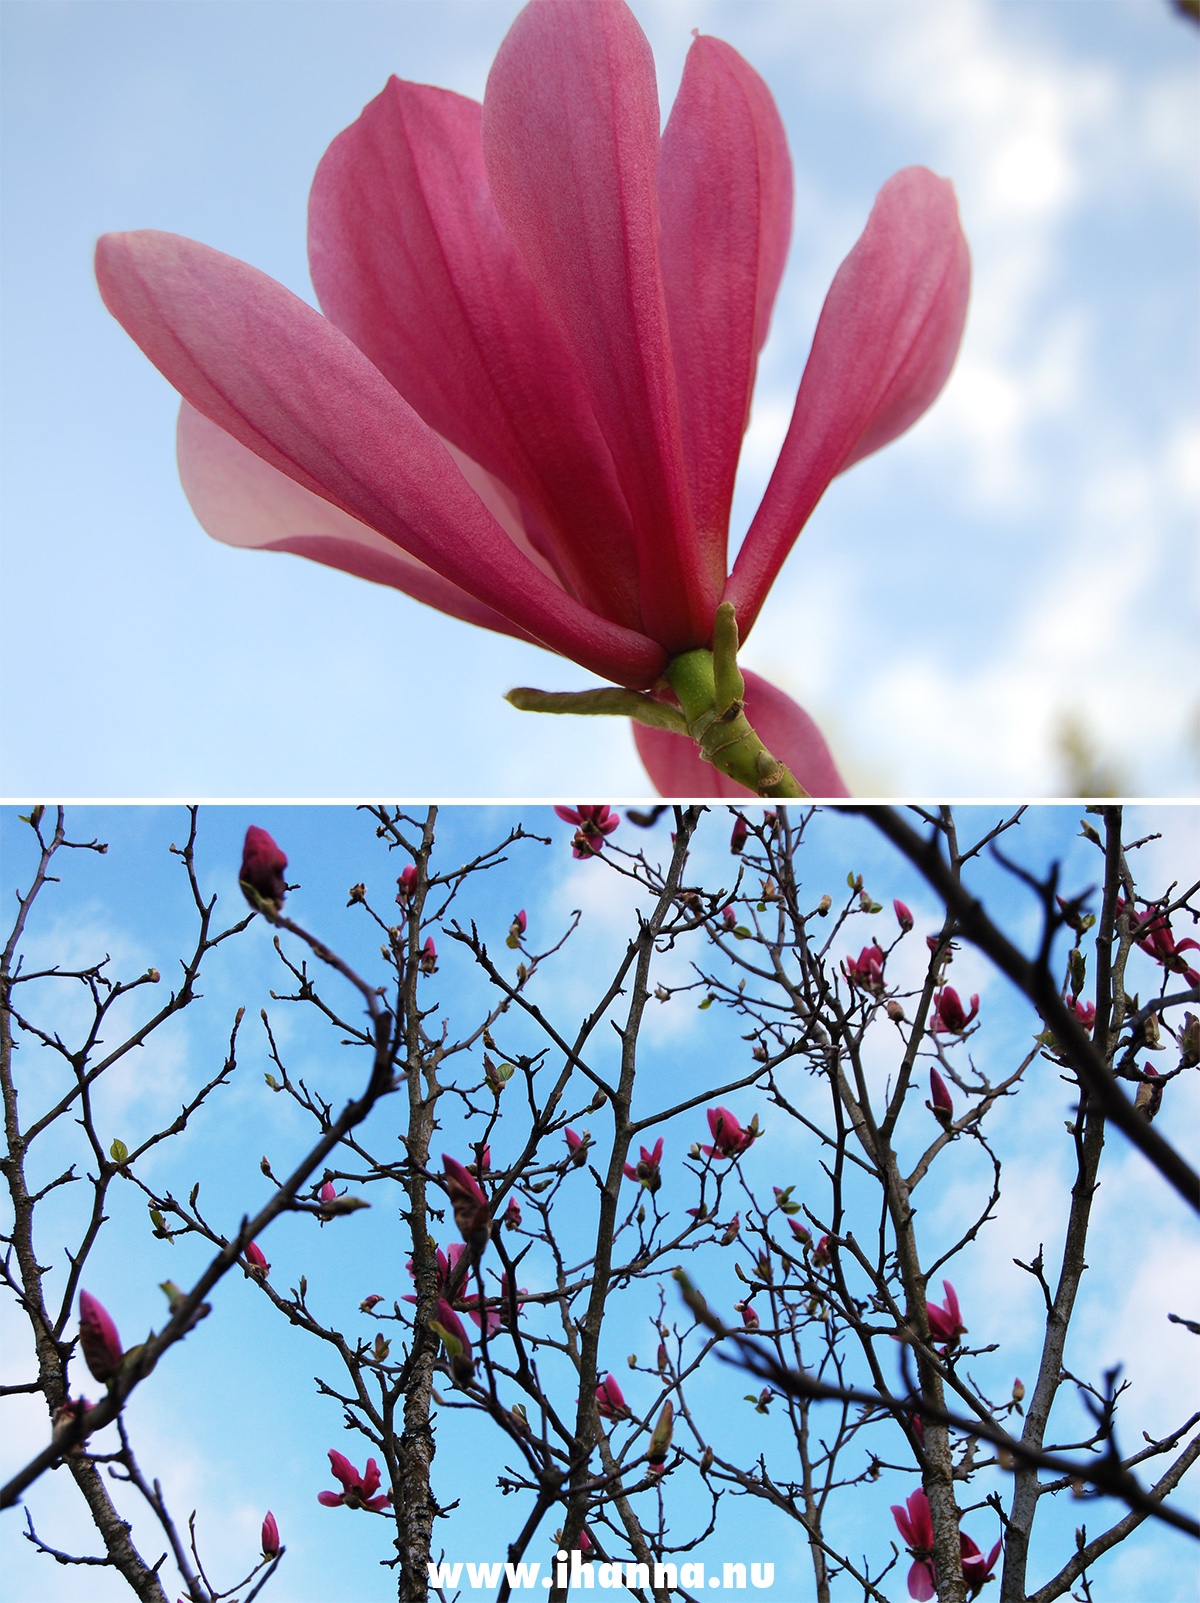 Dad's Magnolia Tree by iHanna - Photo Hanna Andersson